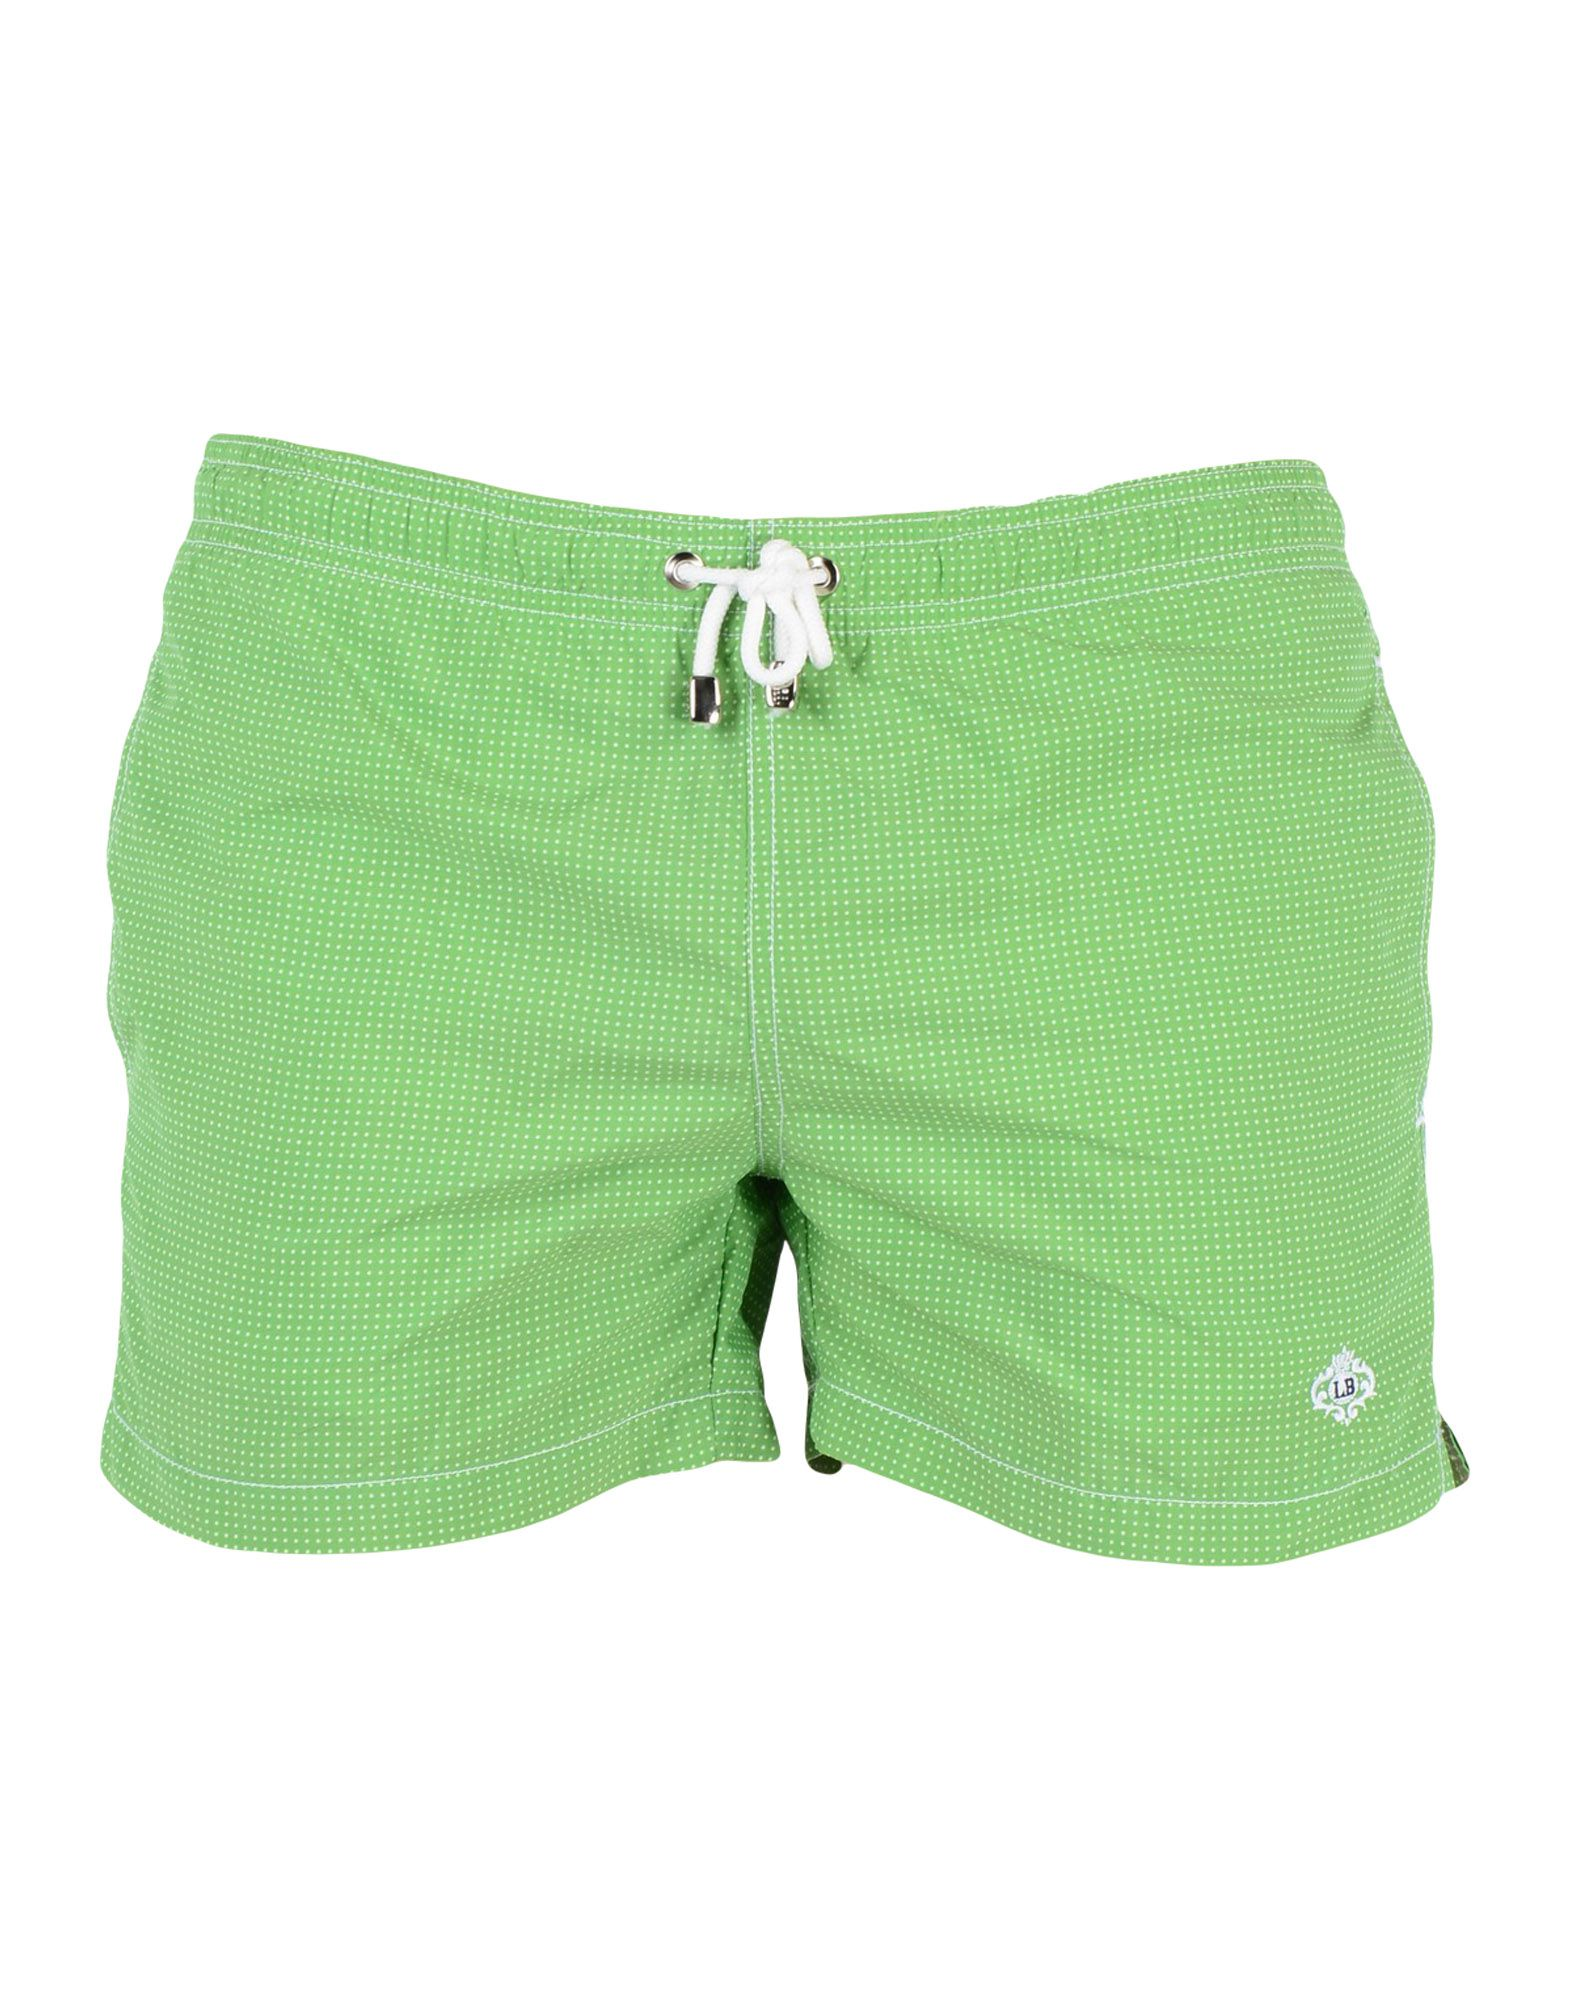 LUIGI BORRELLI NAPOLI Пляжные брюки и шорты luigi borrelli napoli пляжные брюки и шорты